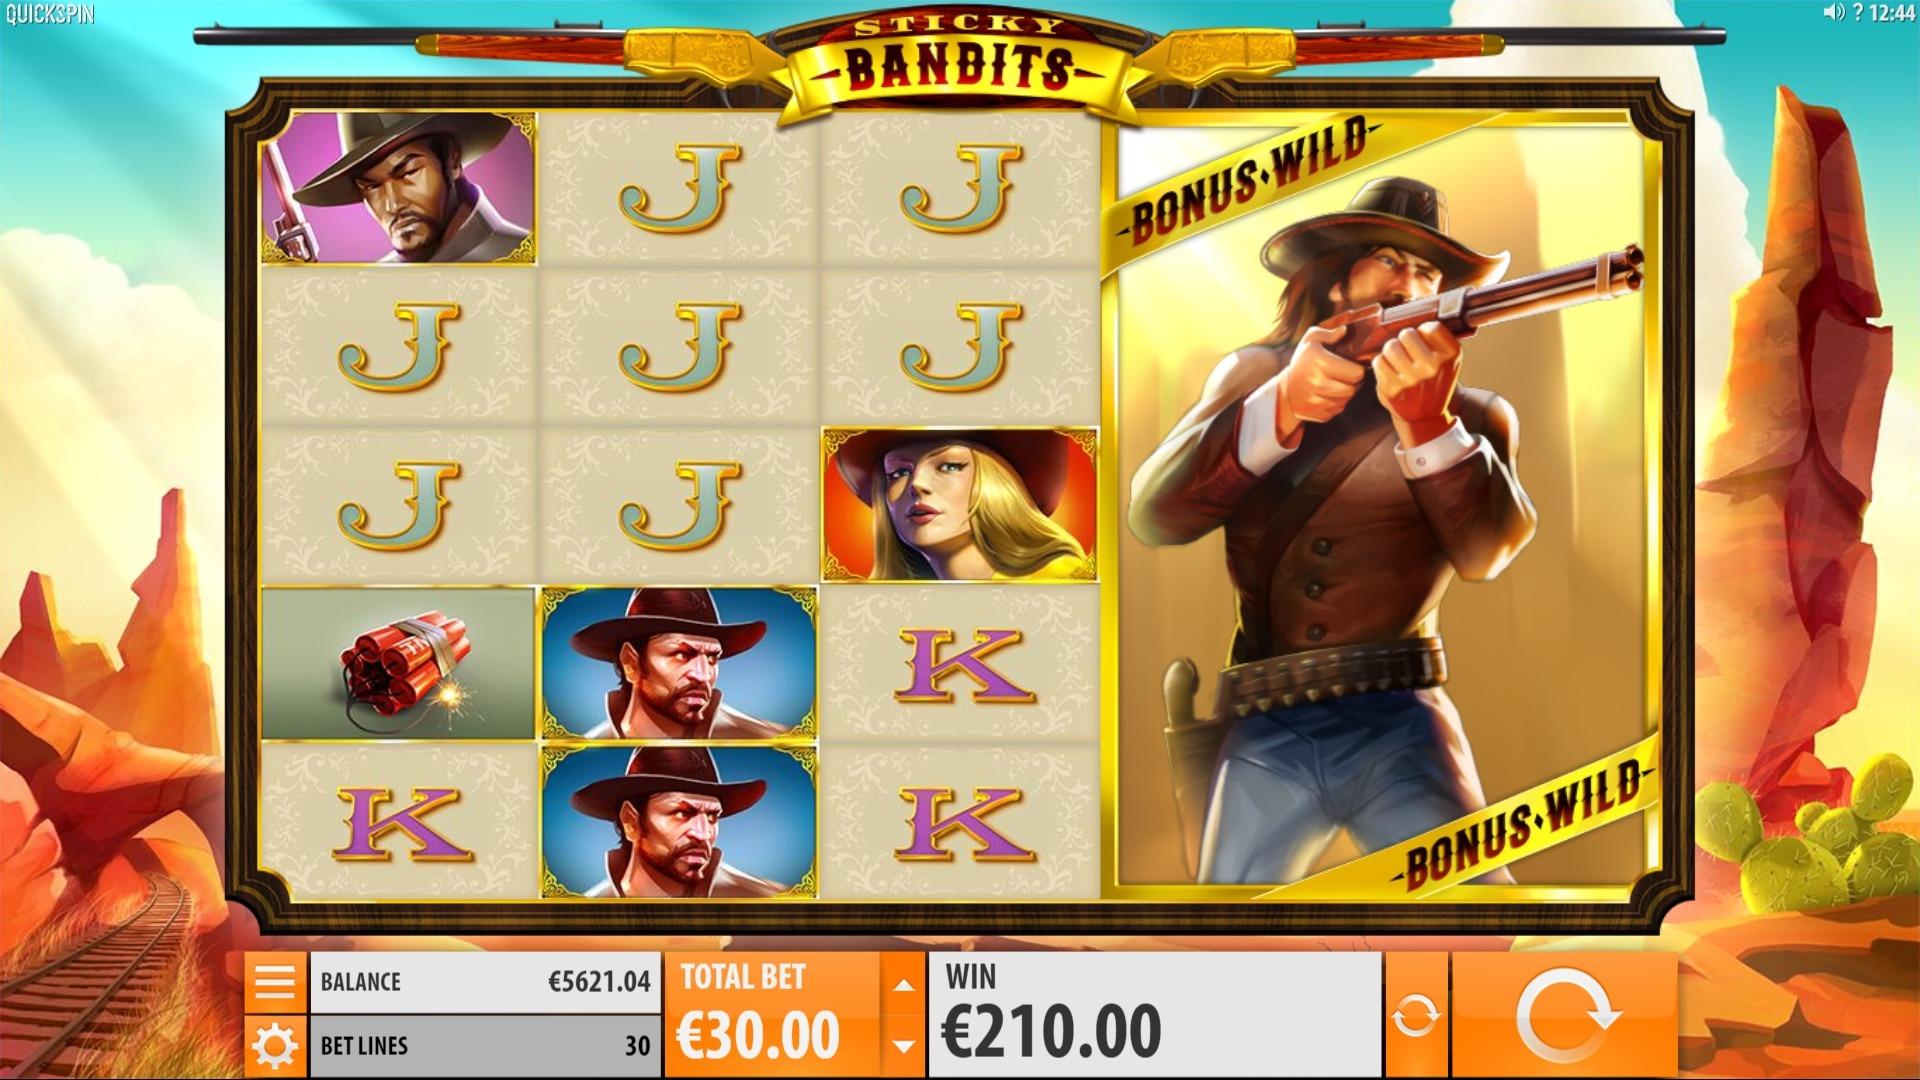 Sticky Bandits Slot Machine - How to Play